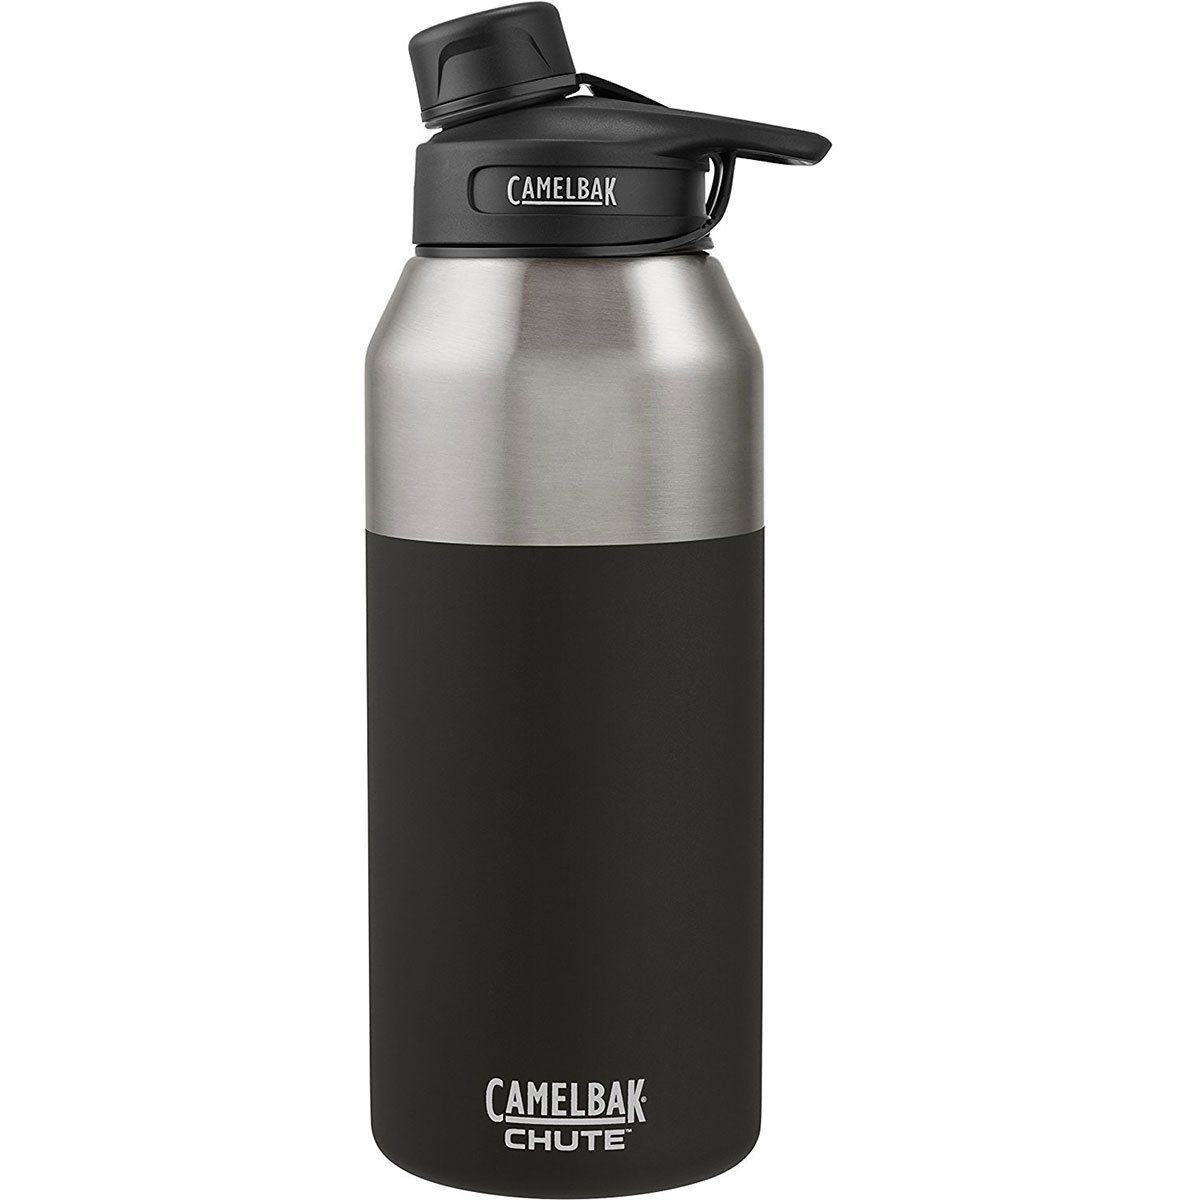 Camelbak Camelbak Trink- und Thermosflasche CHUTE 1.2 l, Jet